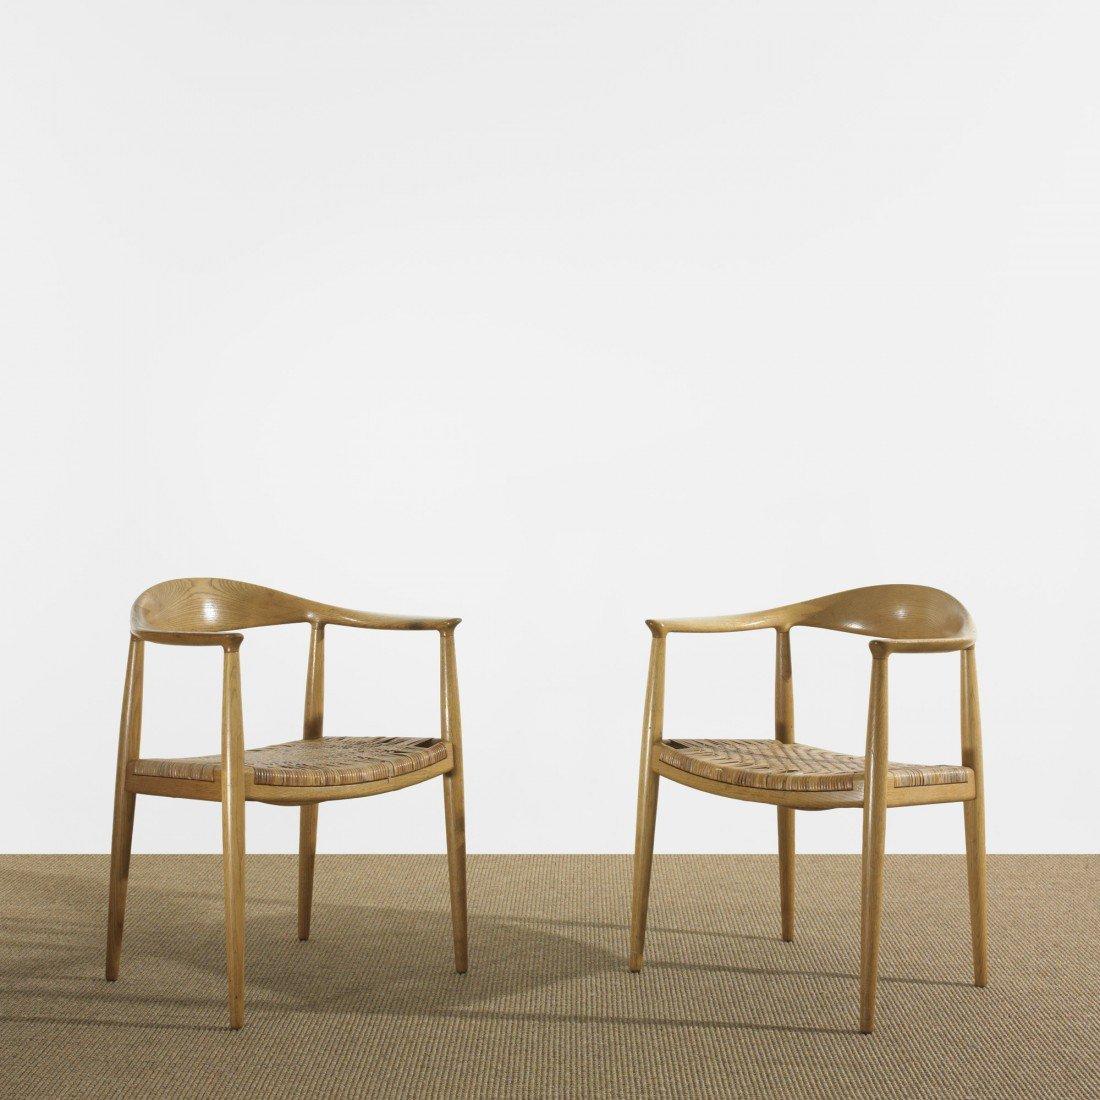 122: Hans Wegner The Chairs, pair